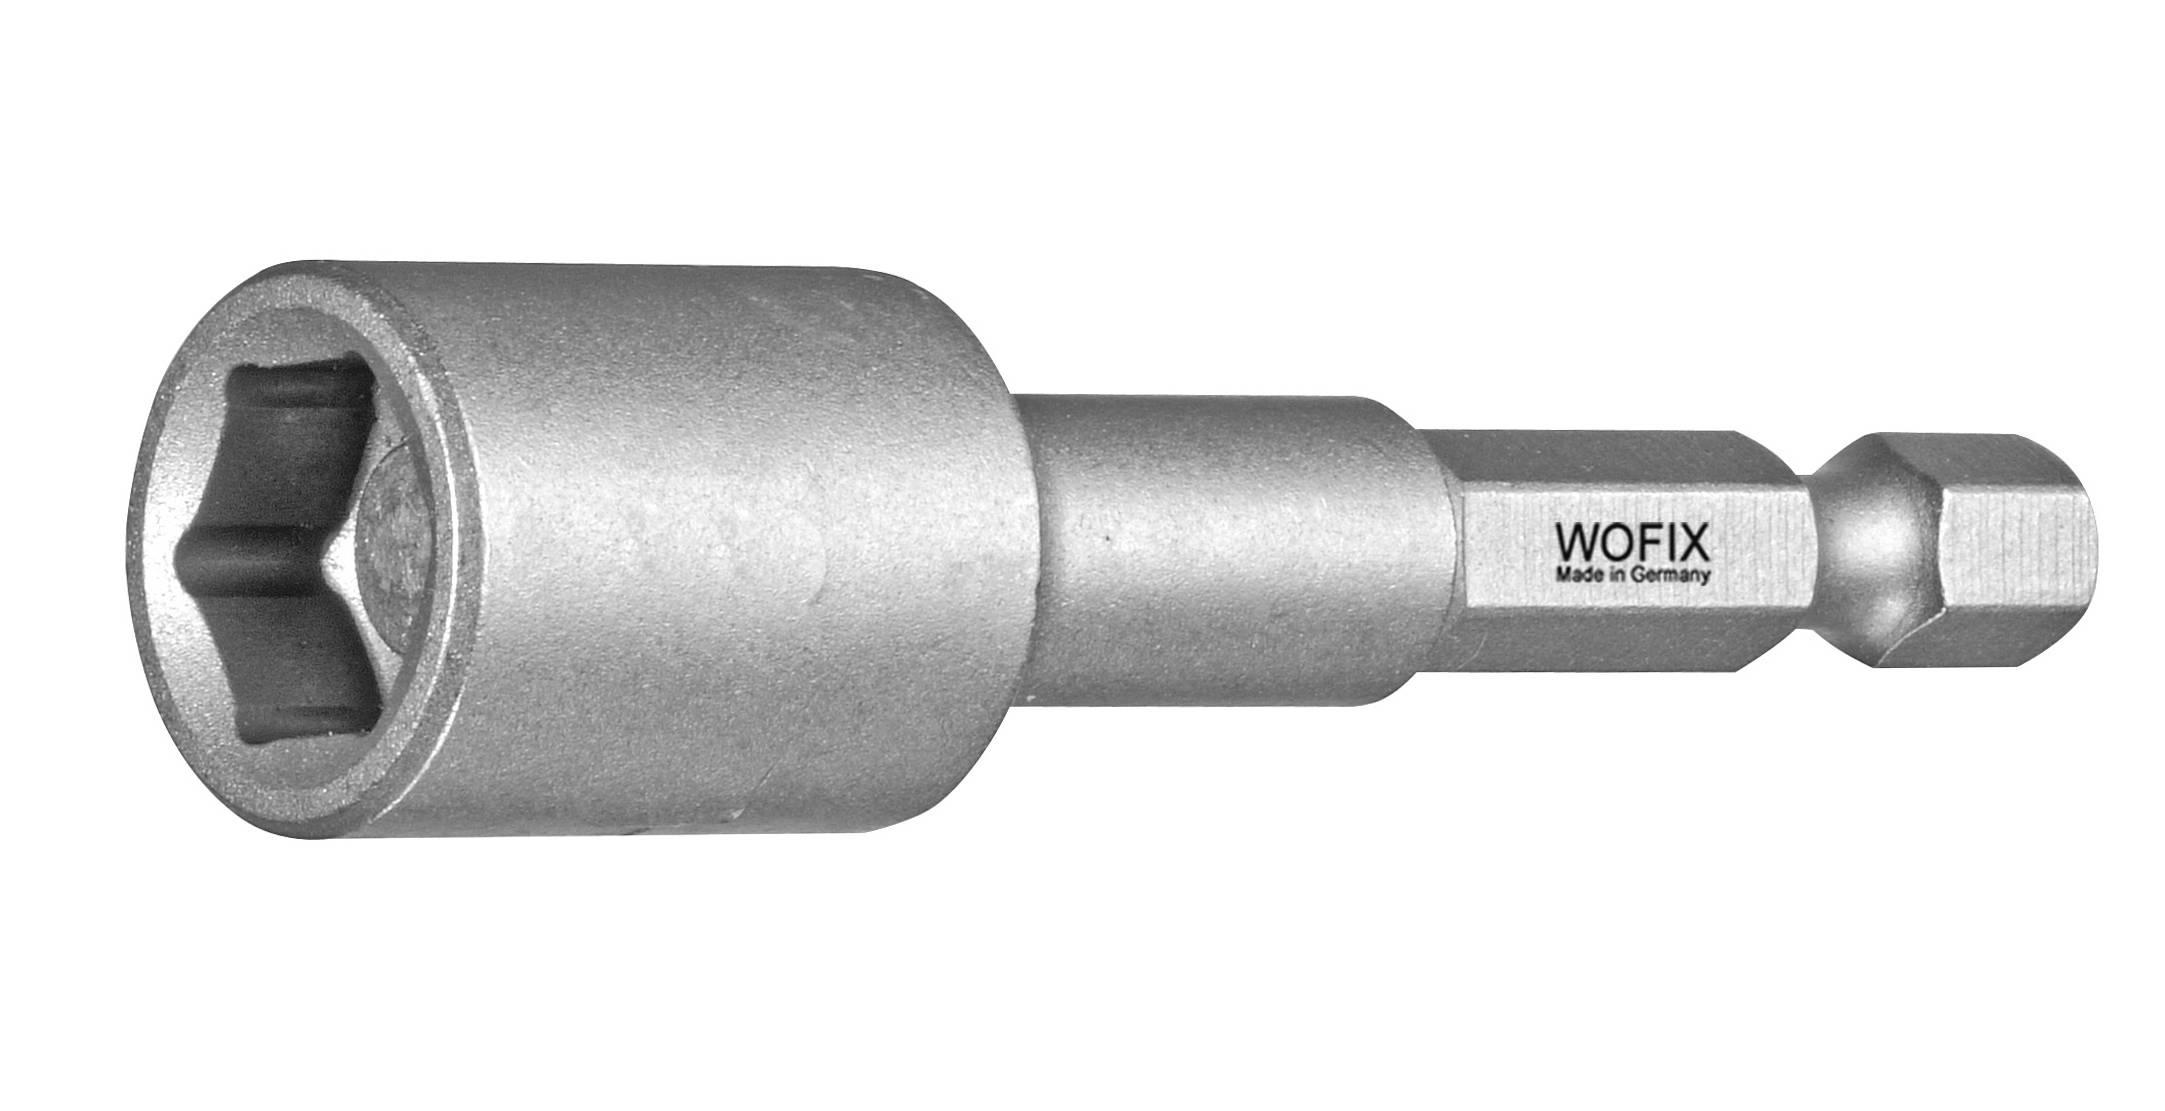 Wofix 7358070 Professional standard Dopbit - SW7,0 50 mm